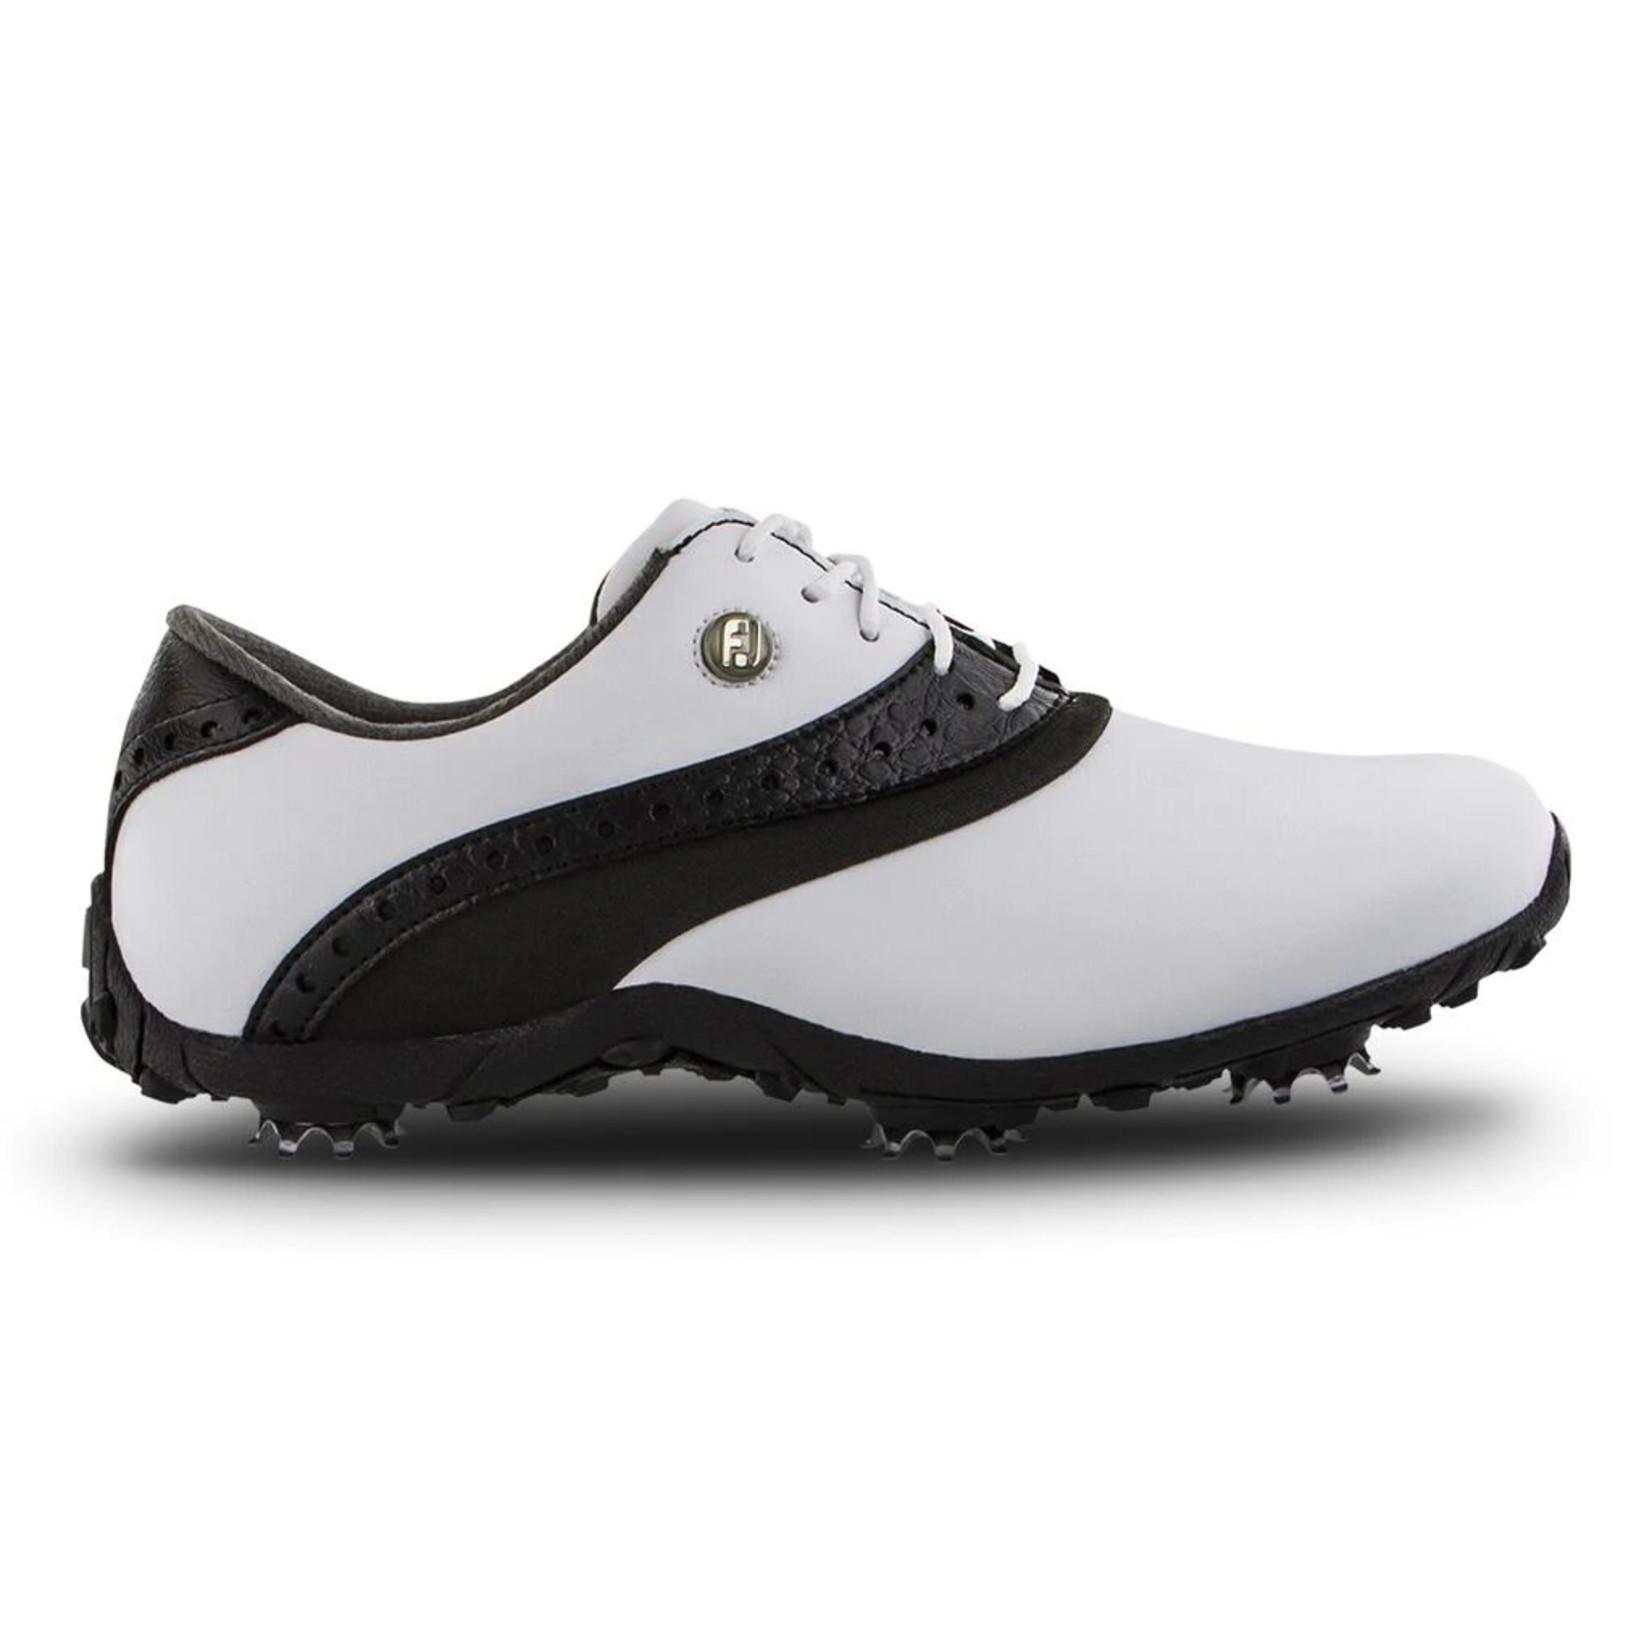 Footjoy FJ Wmns LoPro Cltd Pin Toe Shoe